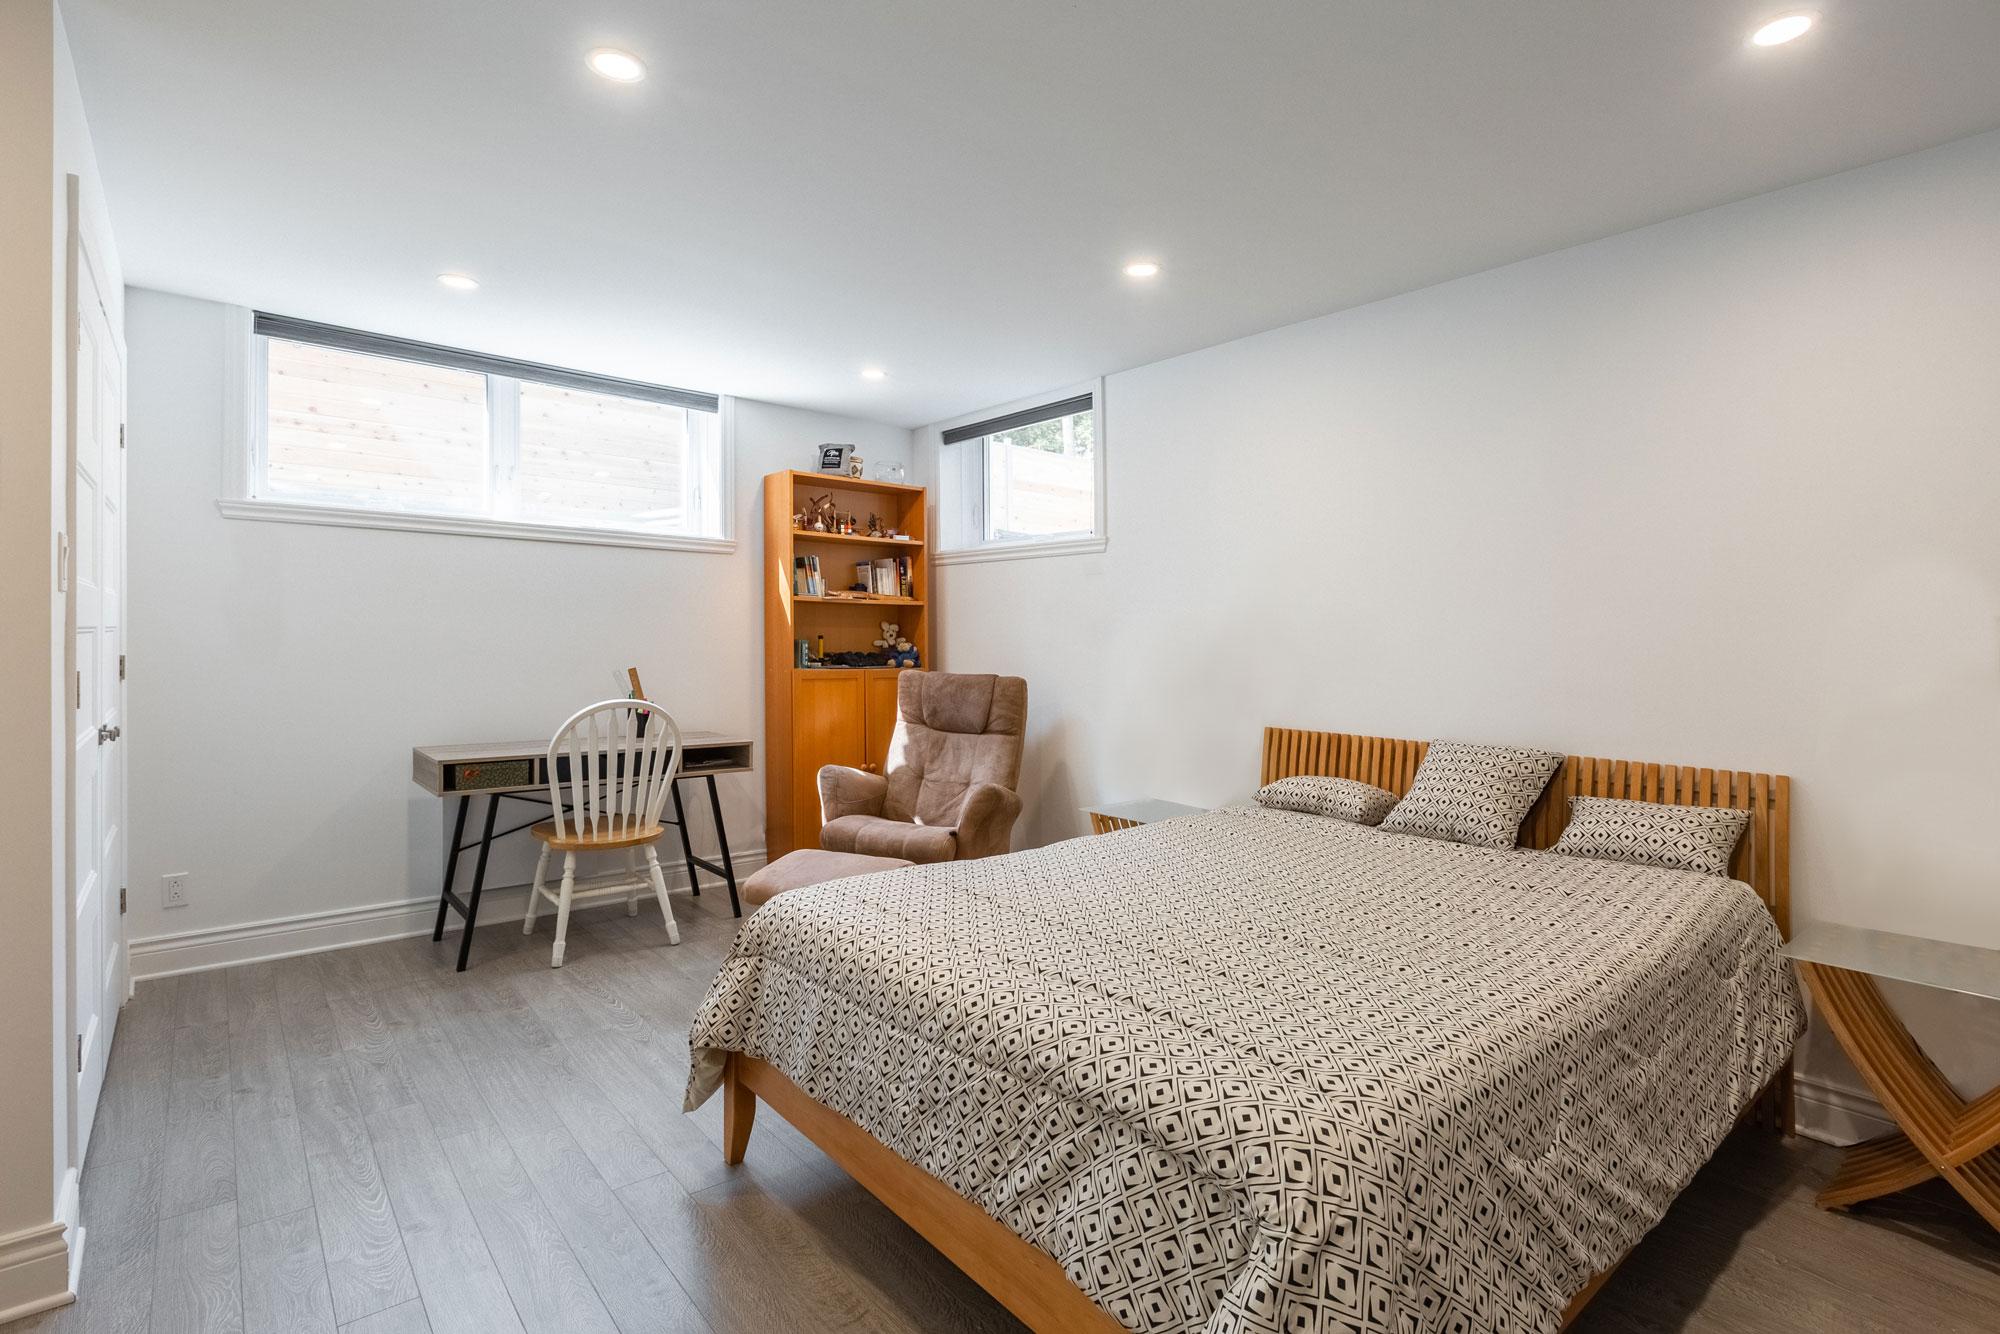 basement bedroom with floating floor, bed and wooden shelf